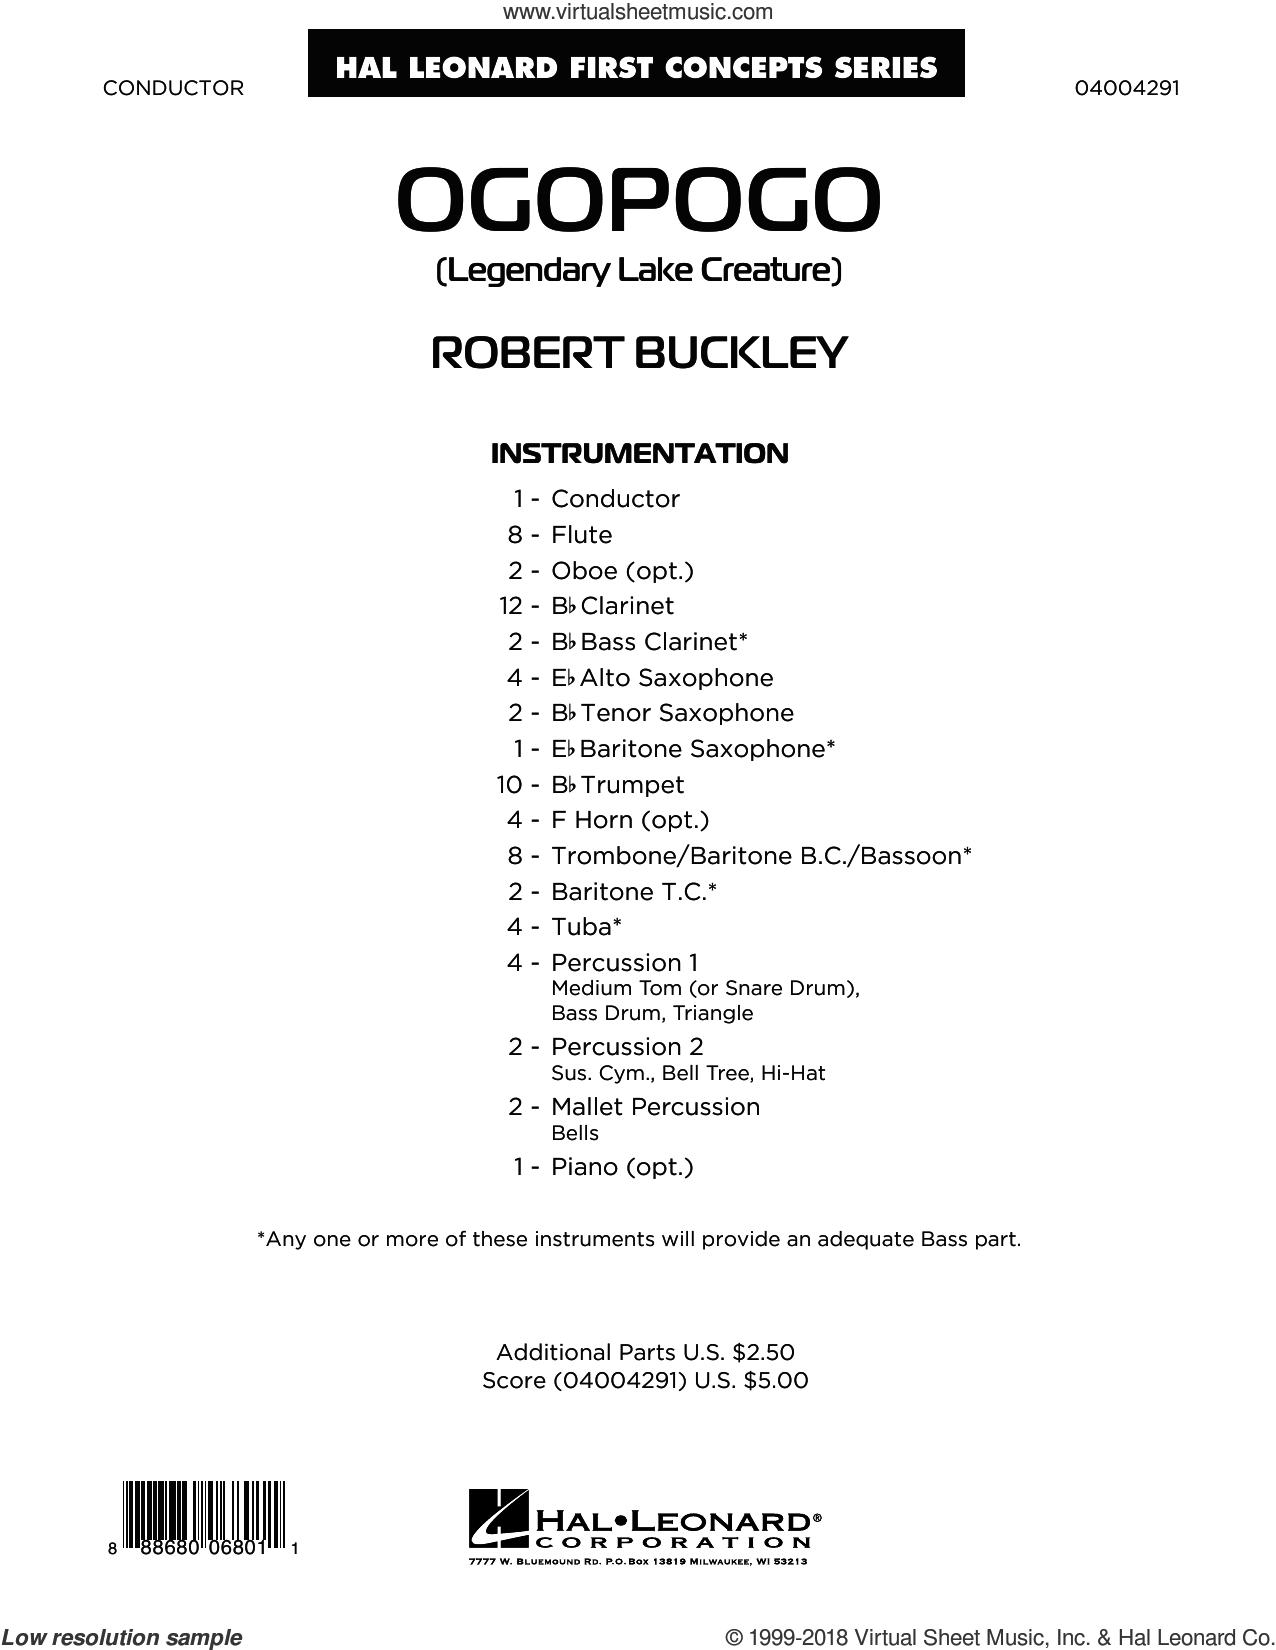 Ogopogo (Legendary Lake Creature) (COMPLETE) sheet music for concert band by Robert Buckley, intermediate skill level